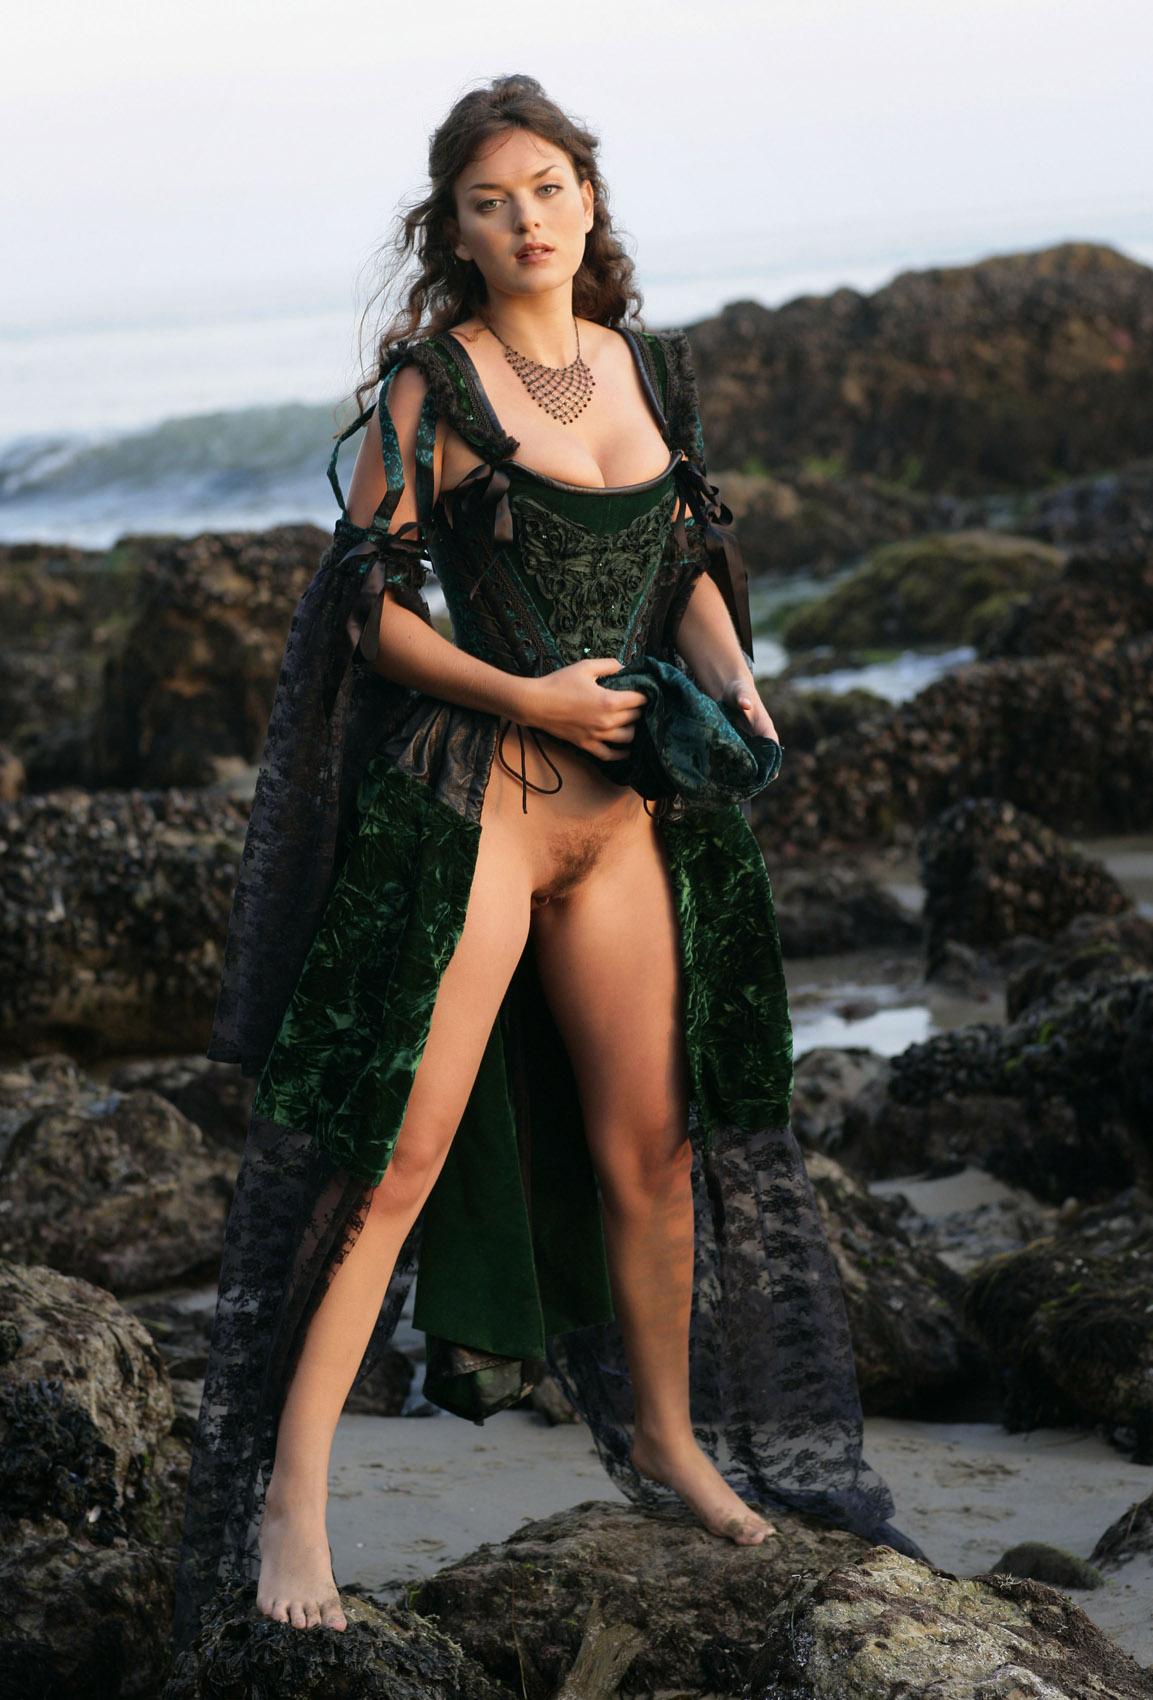 beach galleries Nude